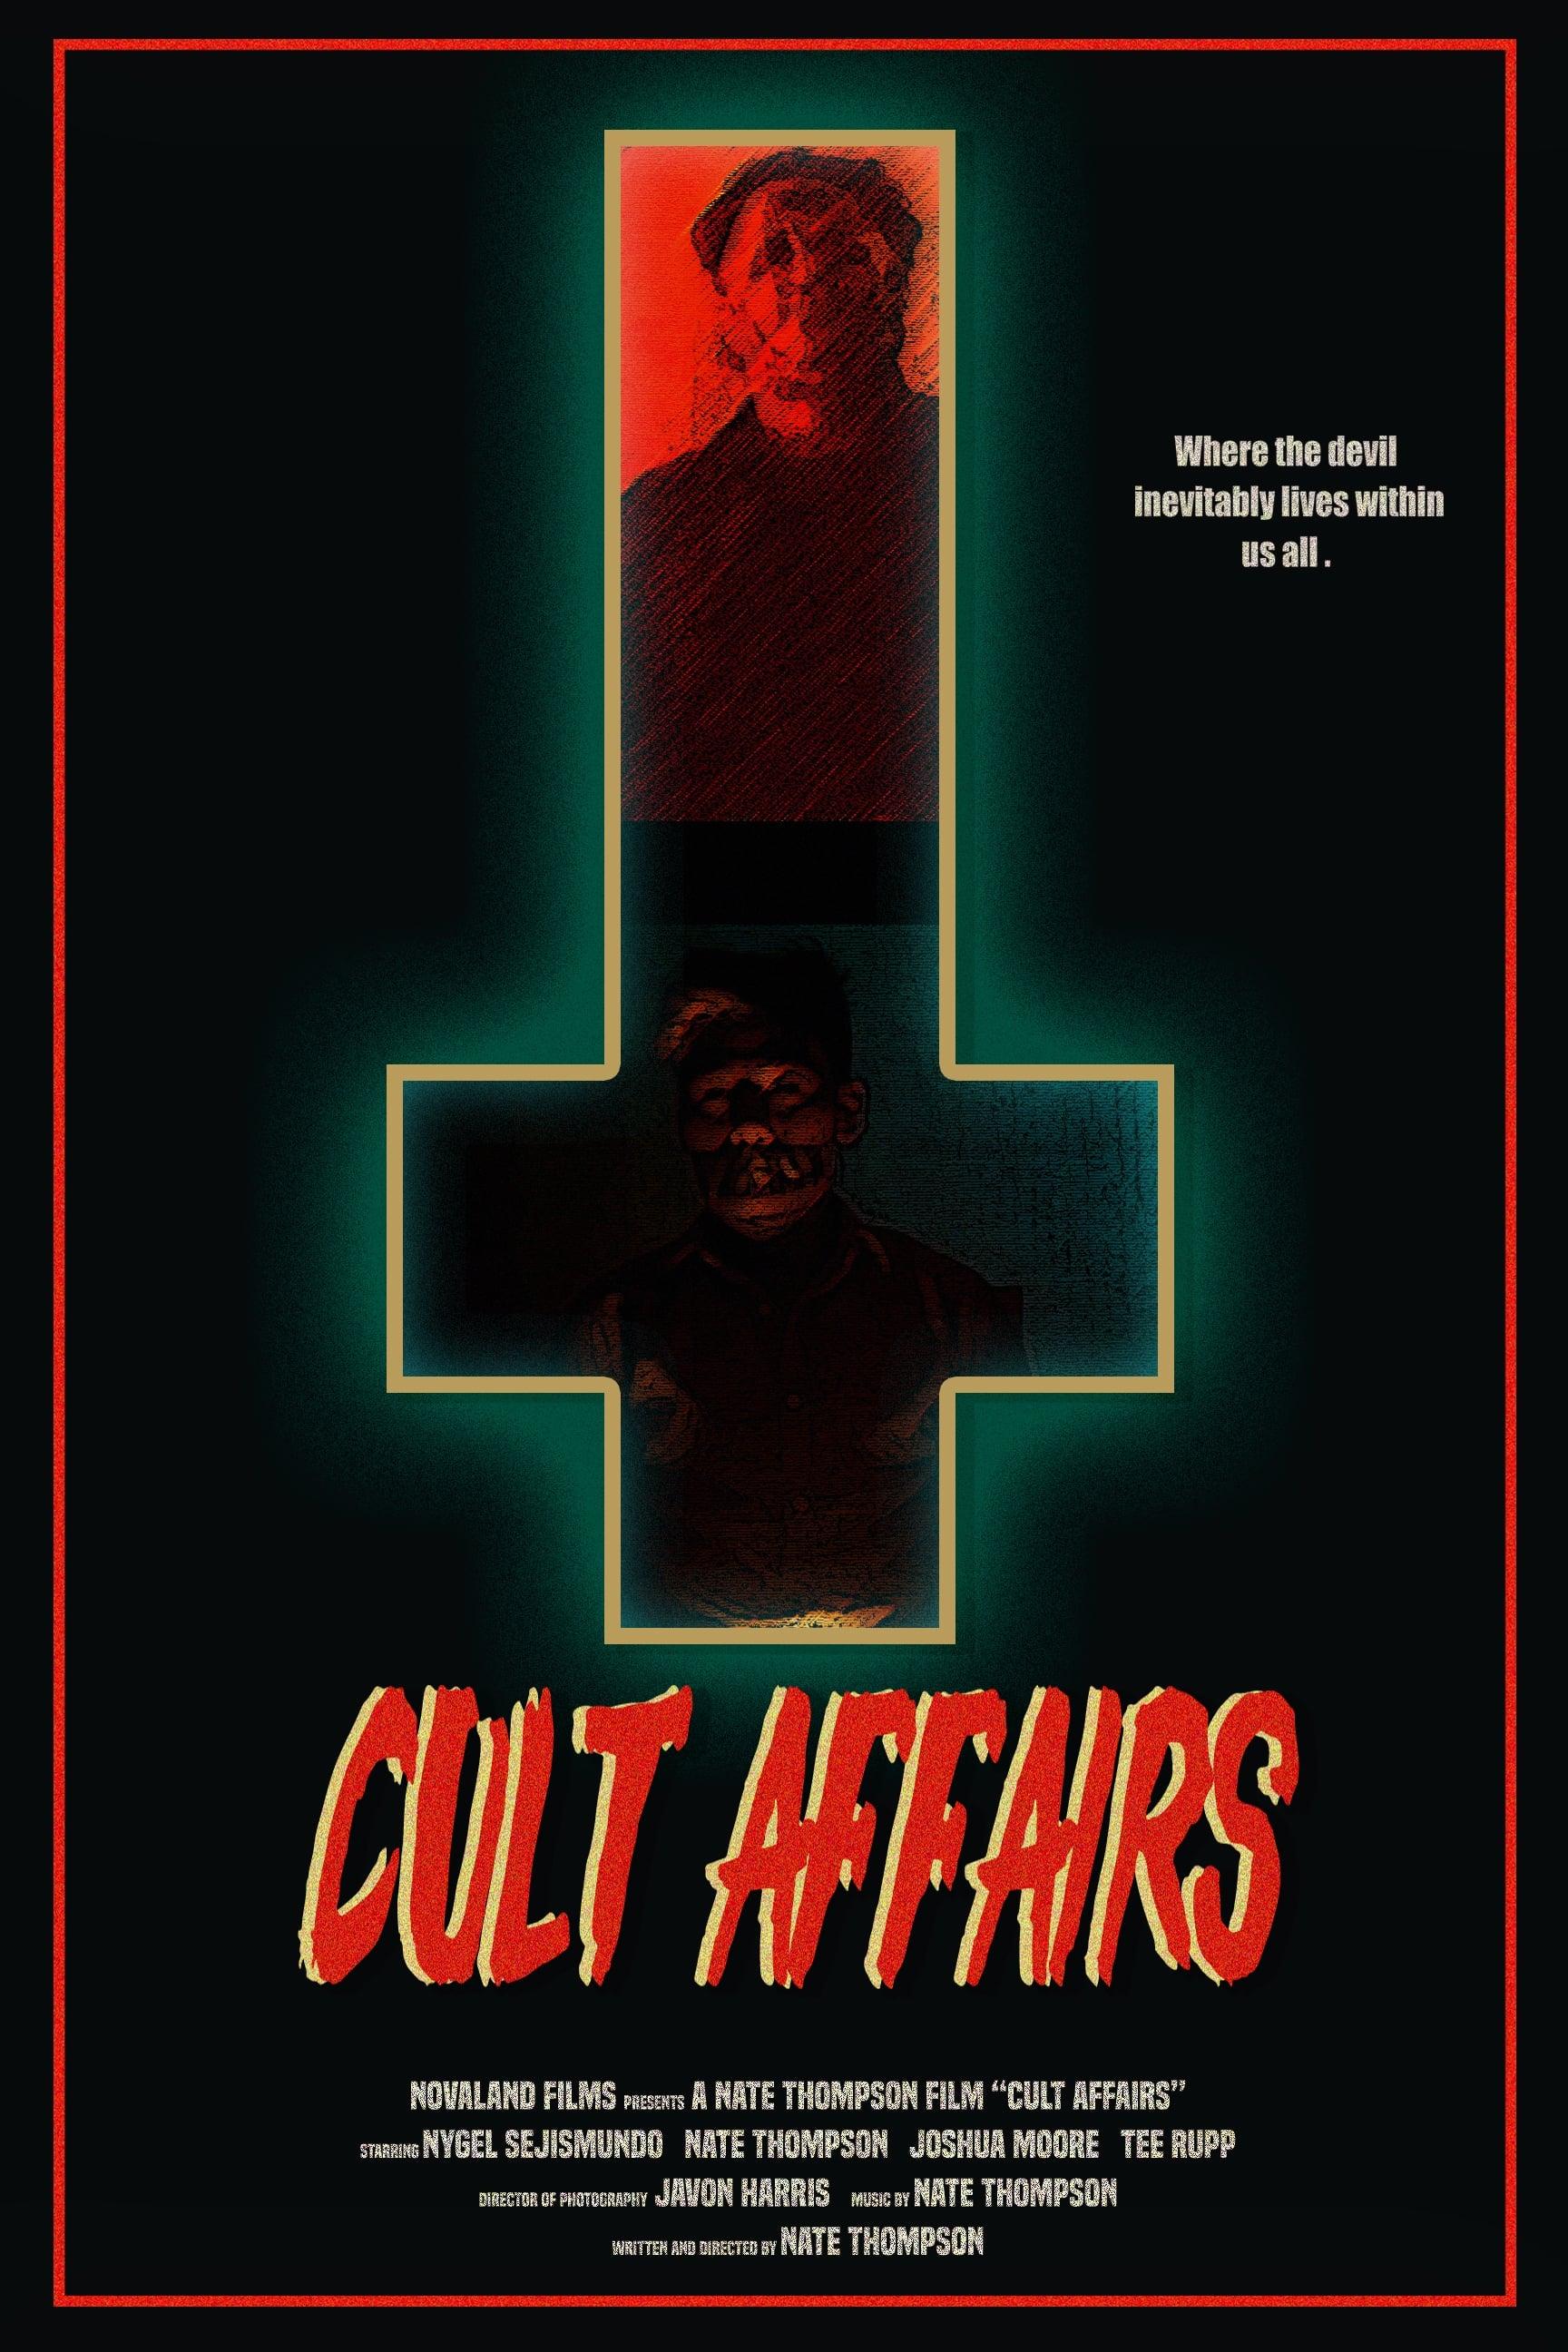 Cult Affairs